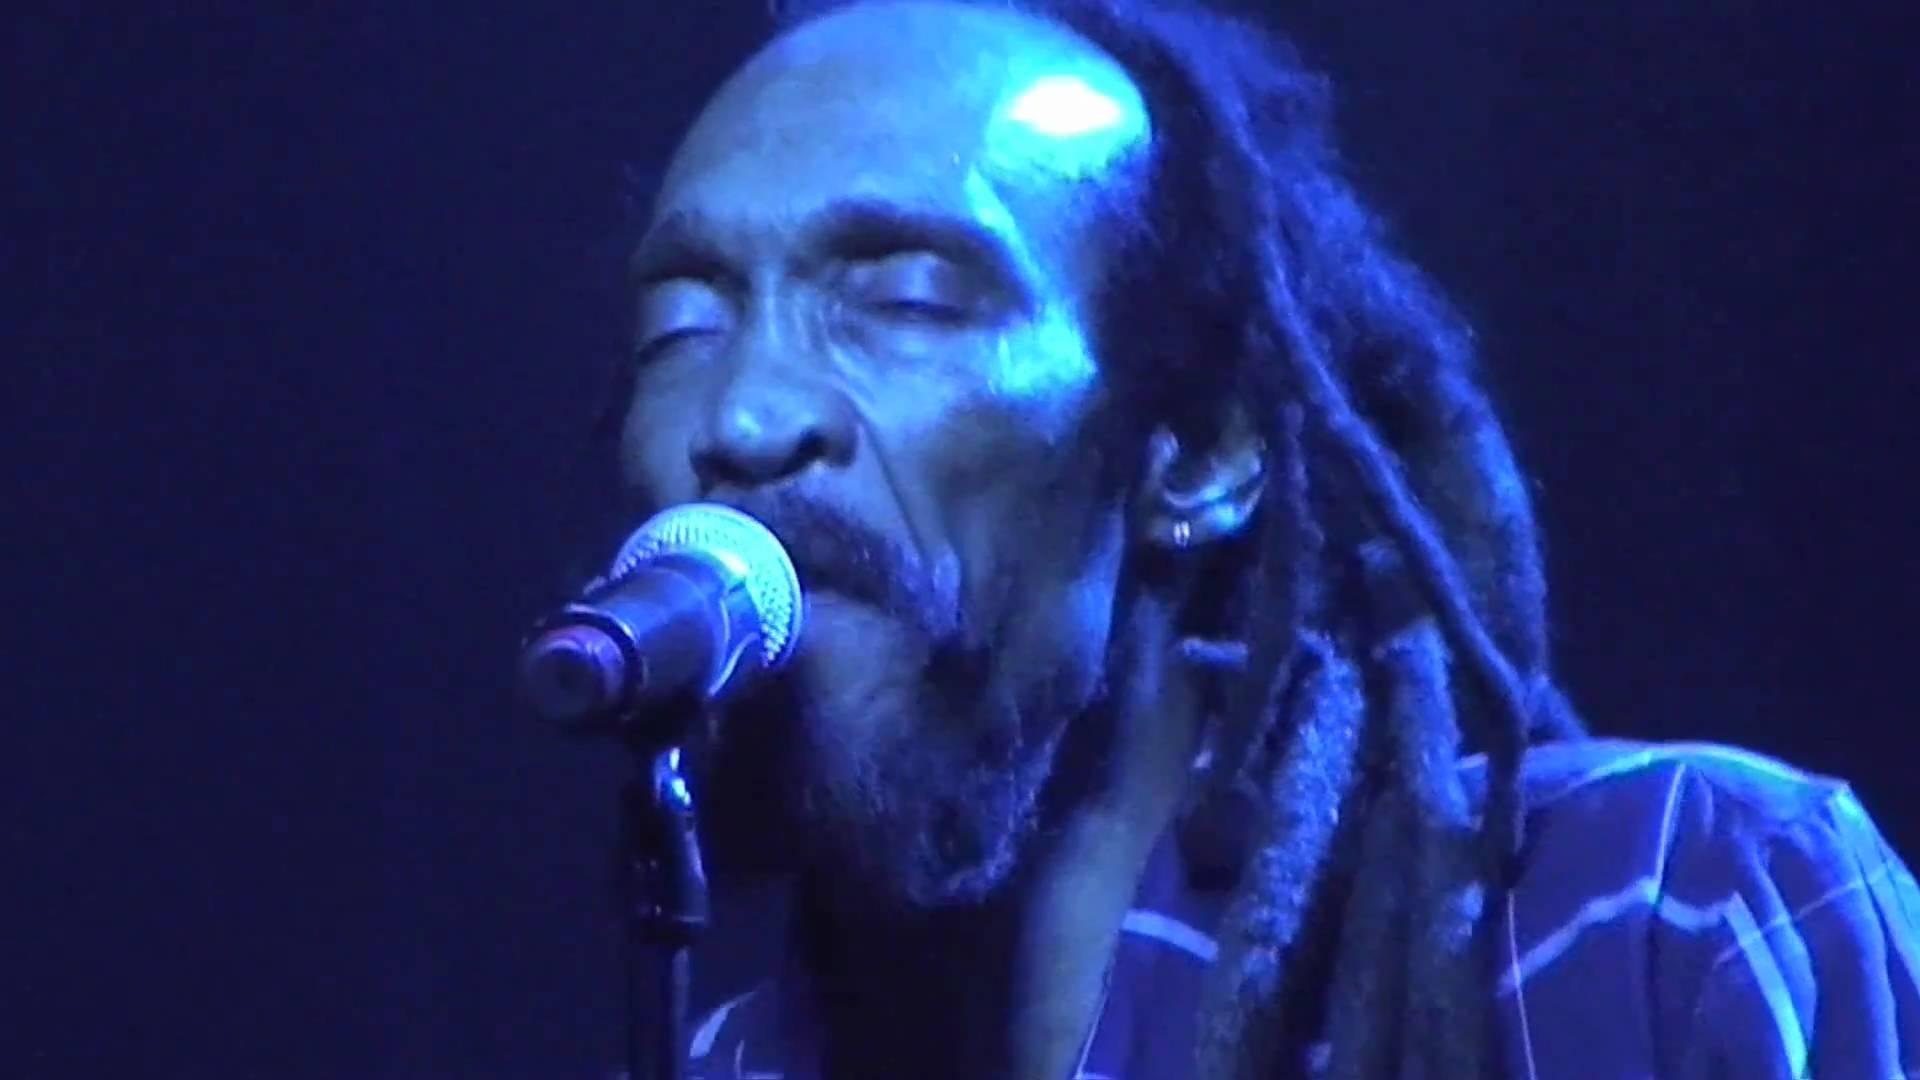 Israel Vibration - Oakland, CA, United States @ Fox Theater [2/26/2011]